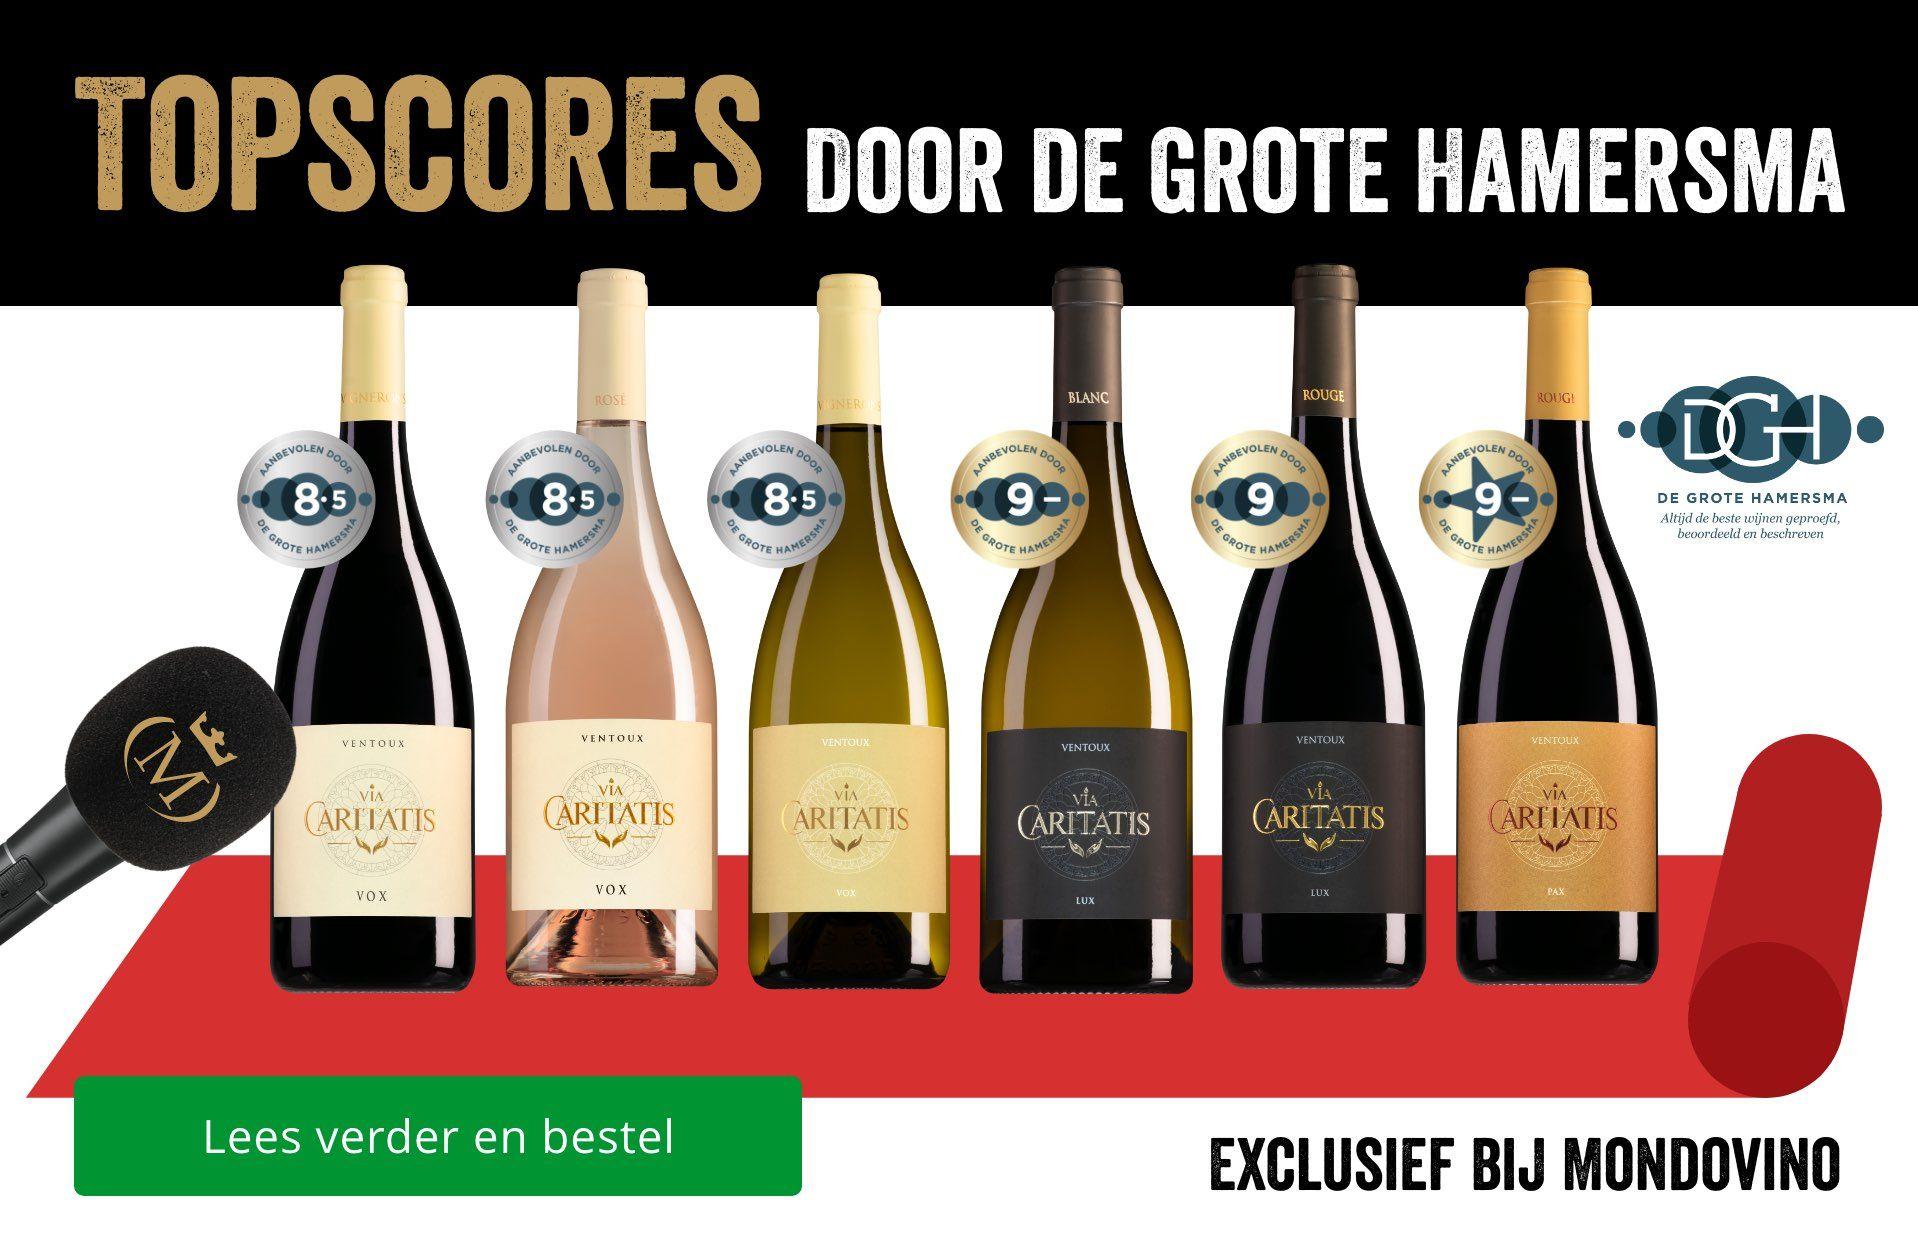 Dia - Via Cartitatis Ventoux topscores door De Grote Hamersma